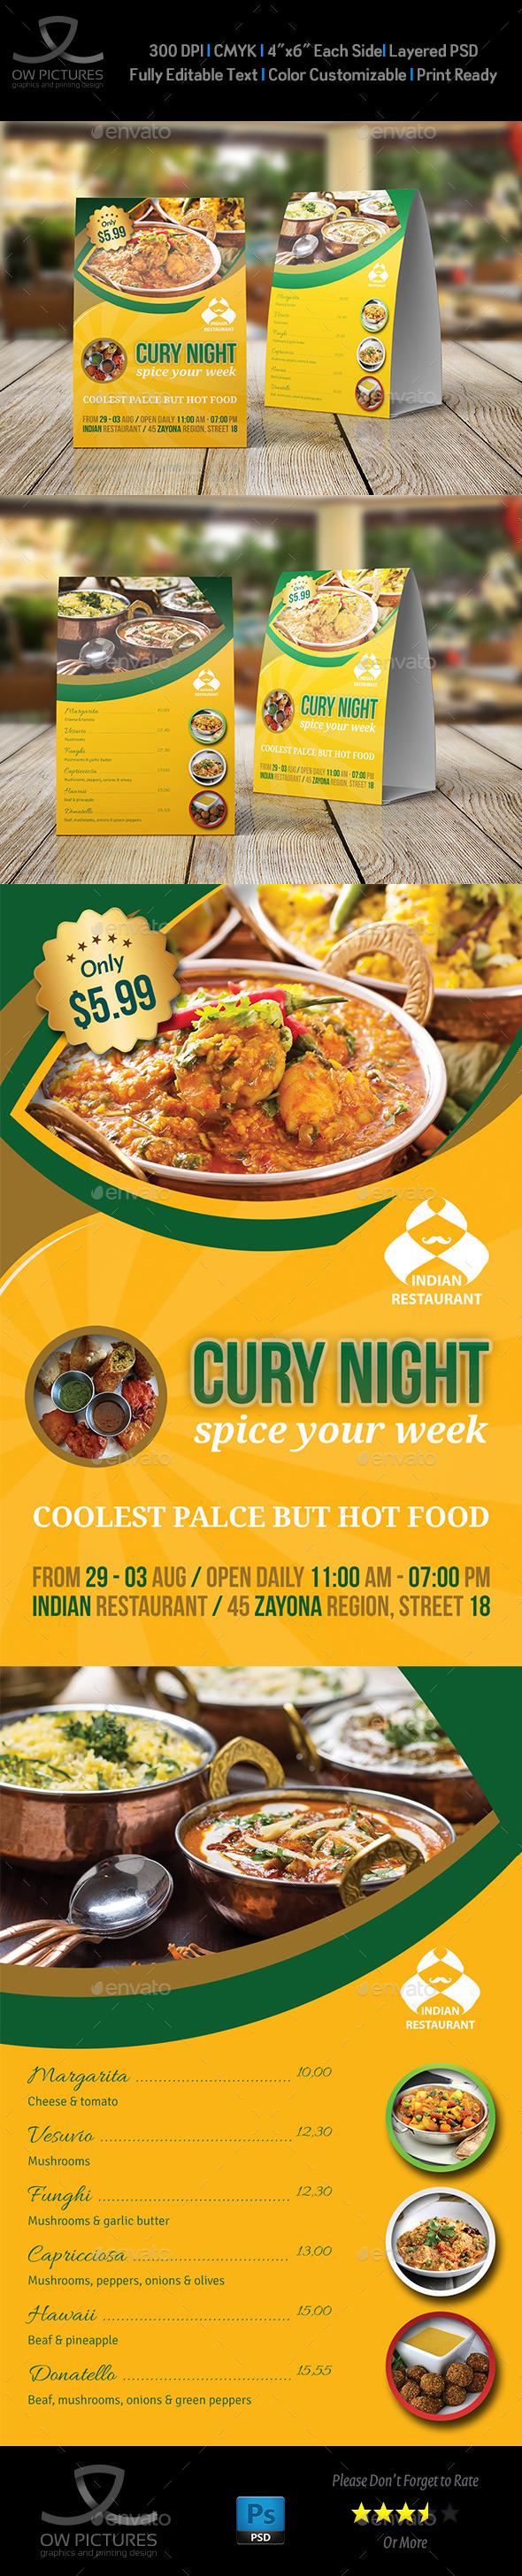 DUM Biryani House  An Indian restaurant in the heart of Soho